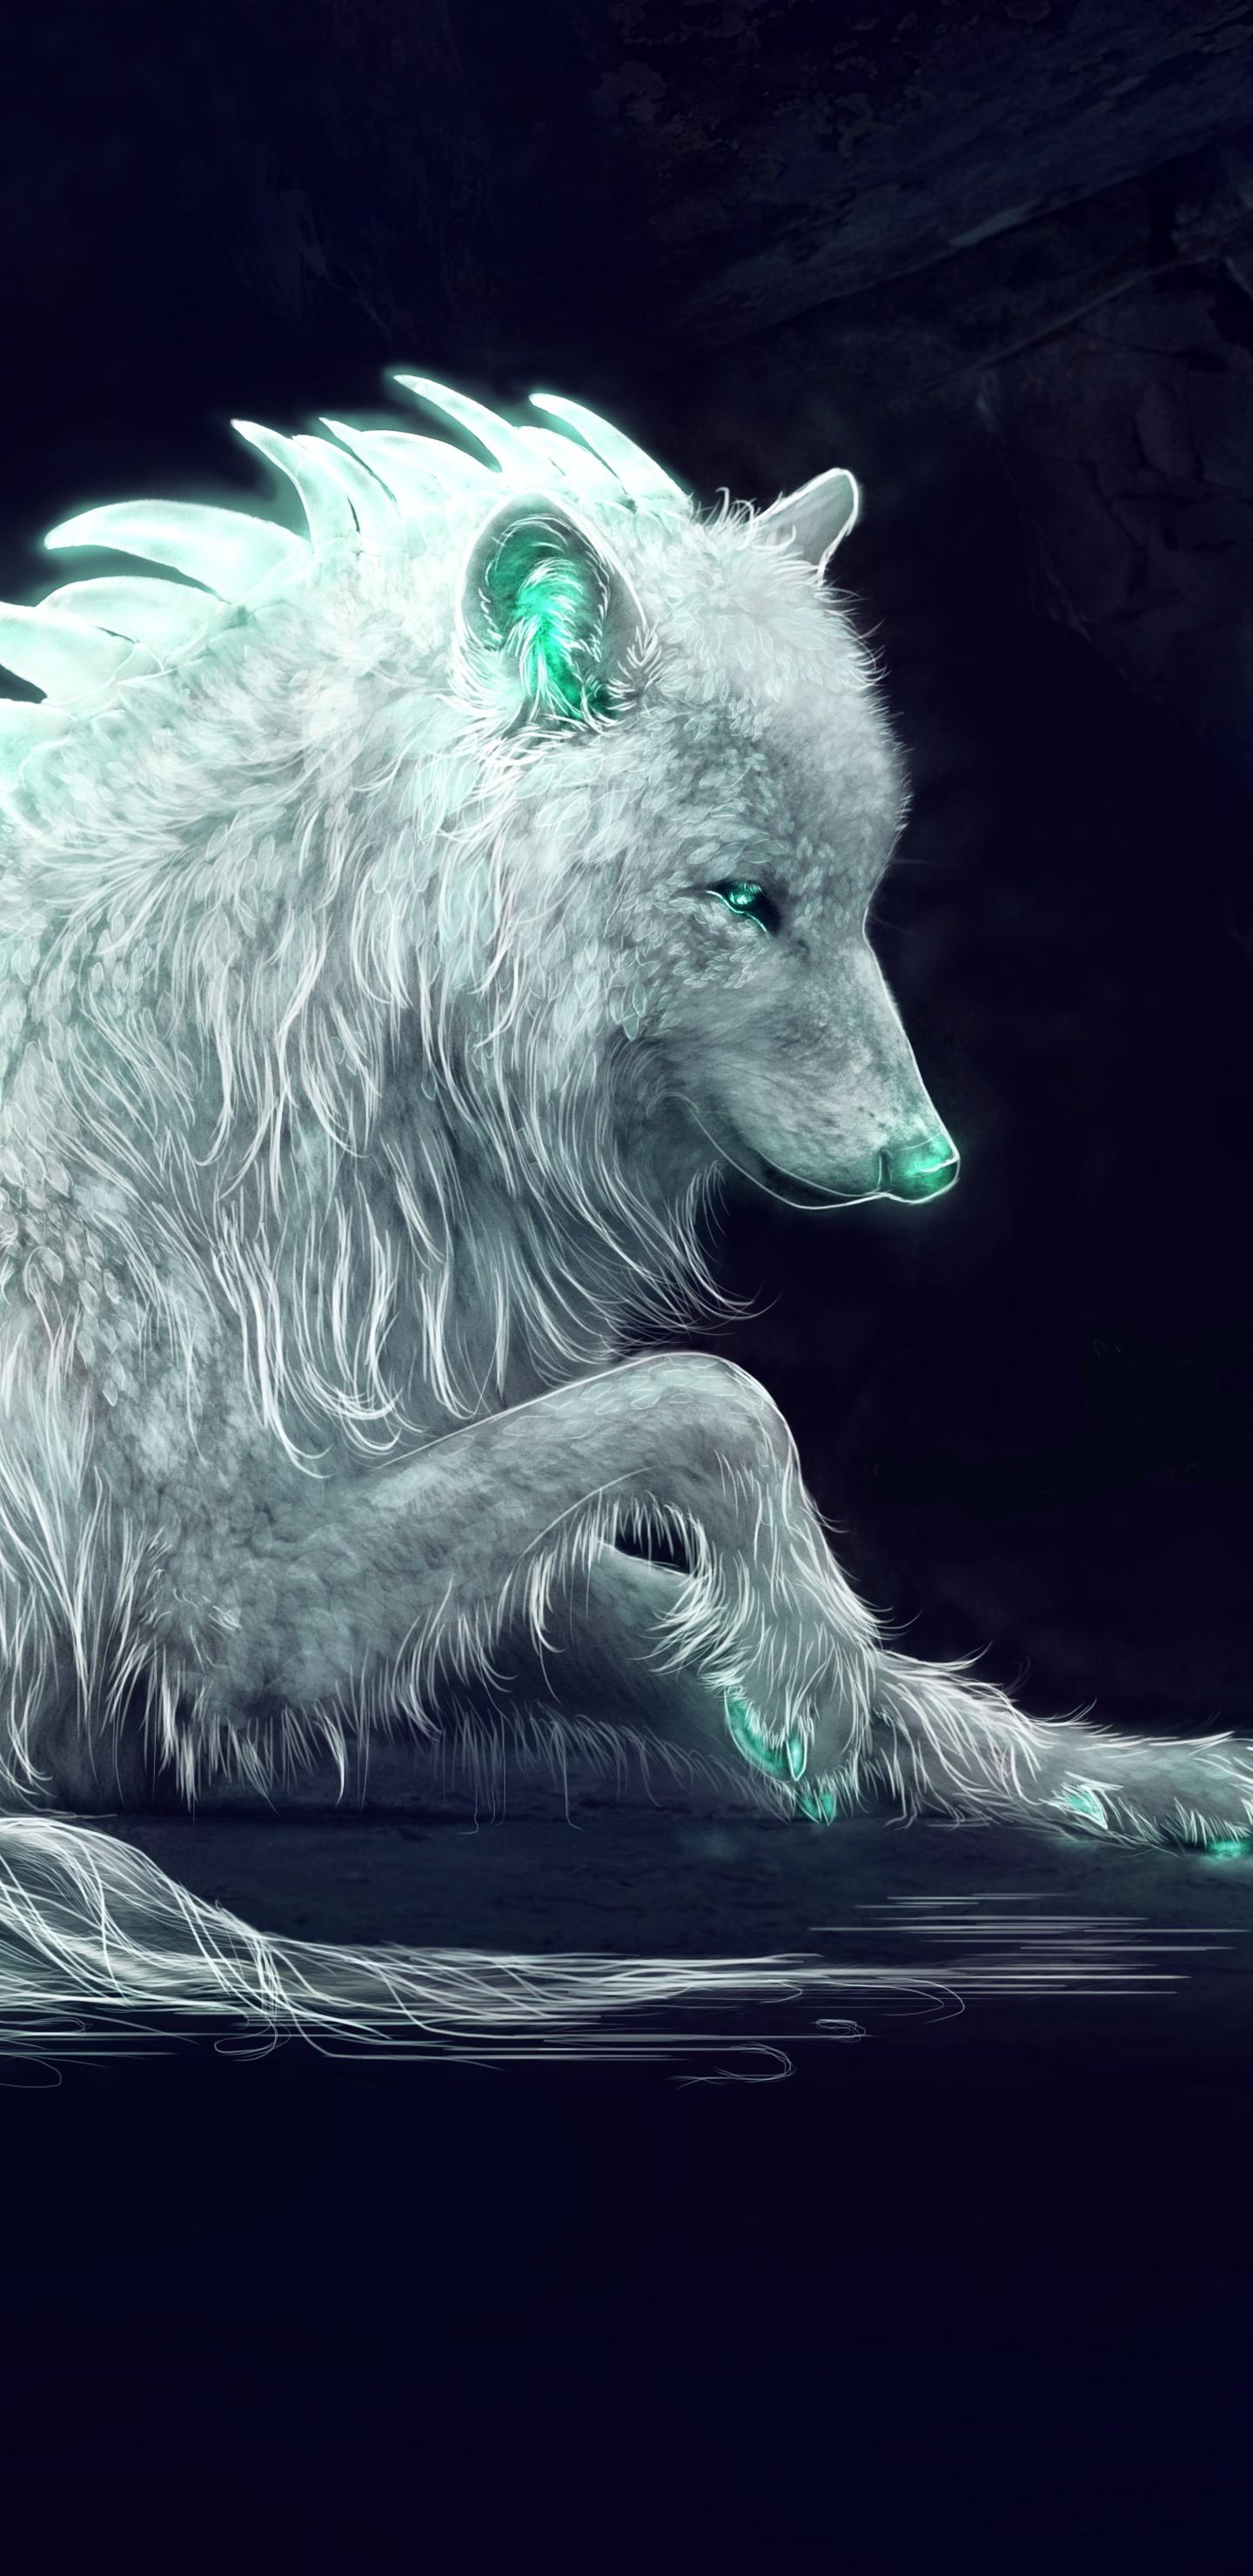 1440x2960 White Wolf Fan Art Samsung Galaxy Note 9,8, S9 ...